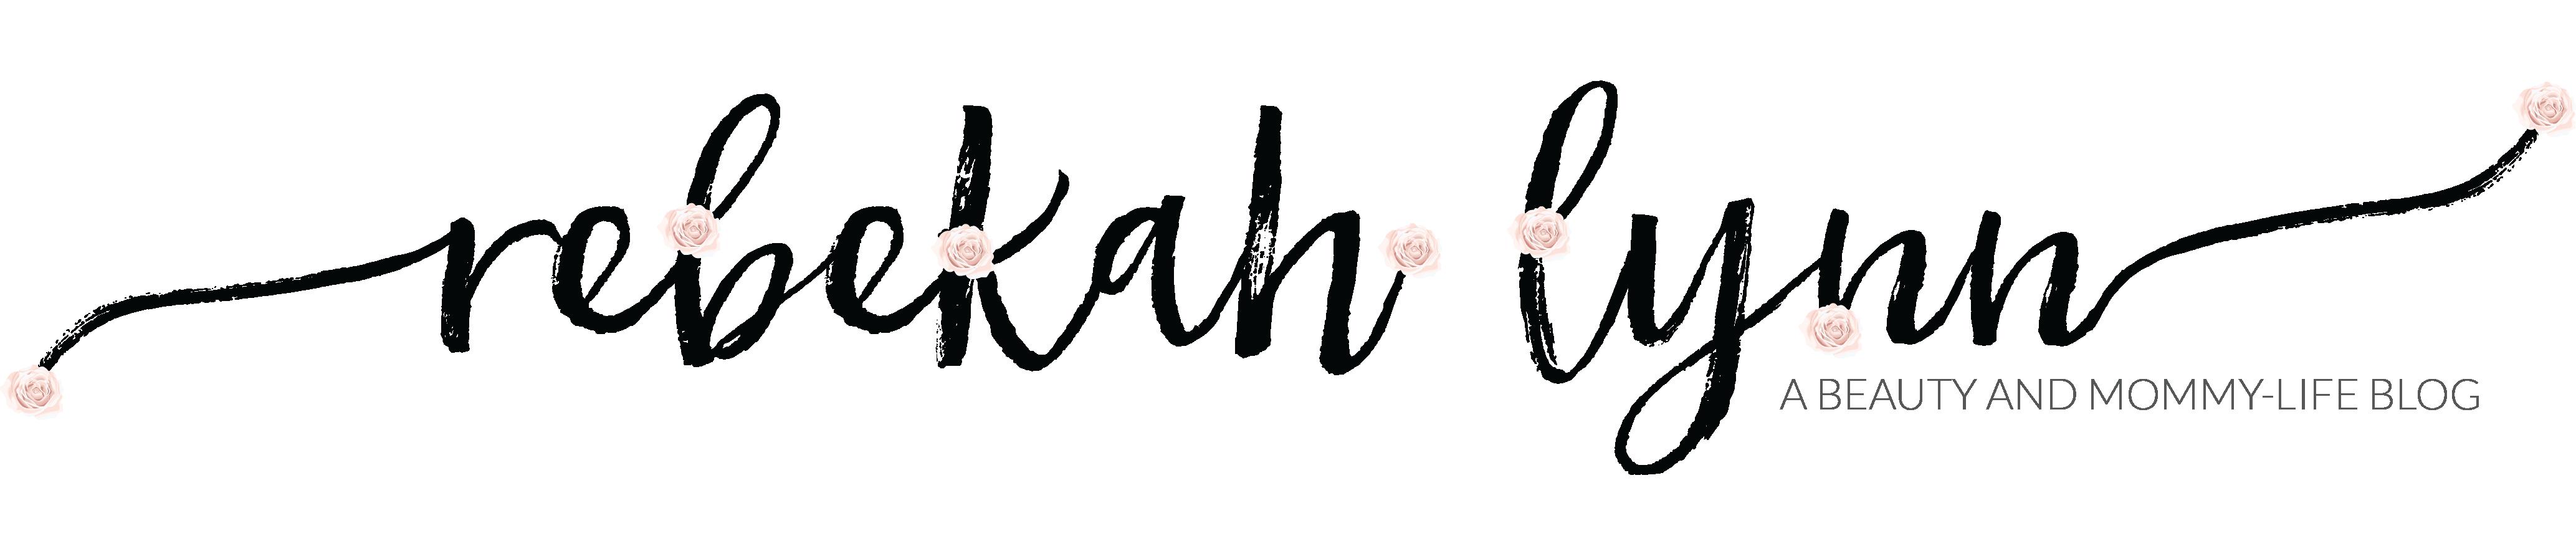 Rebekah Lynn: Canadian Beauty & Mommy-Life Blog